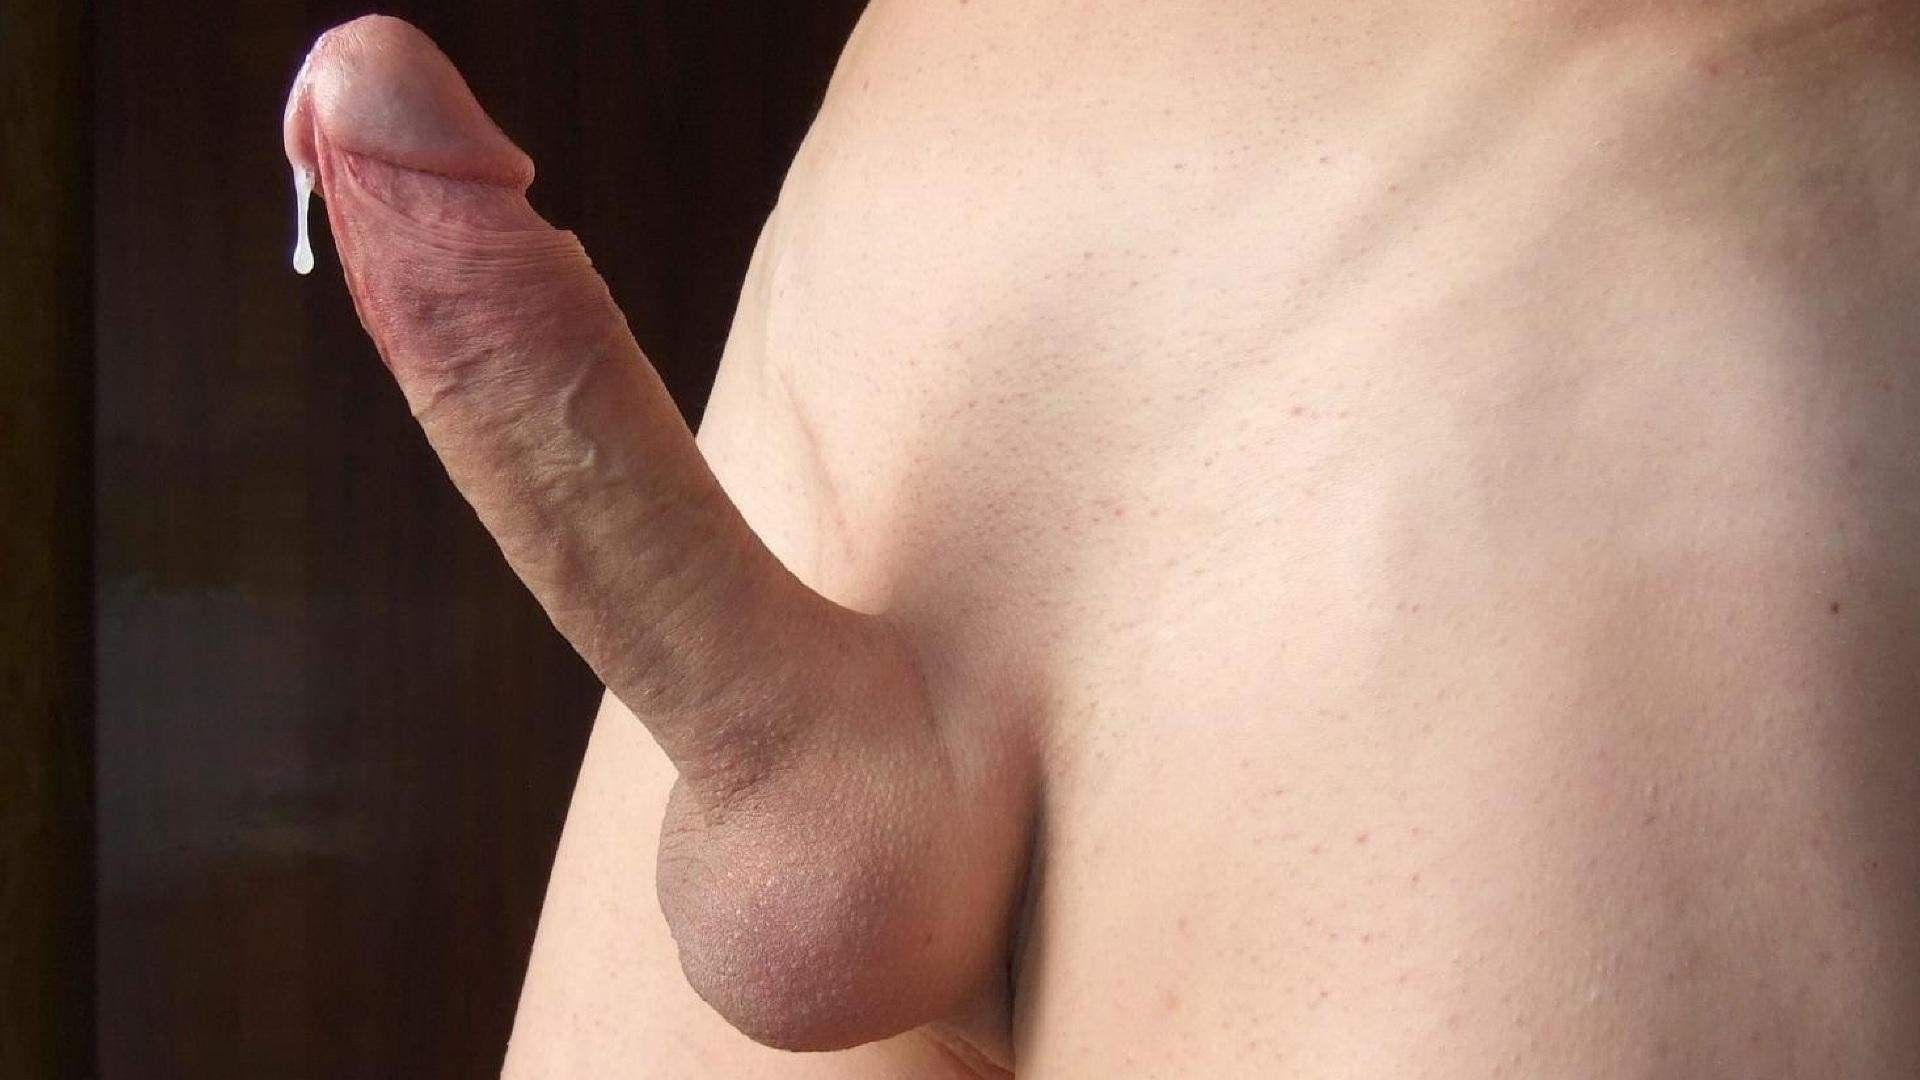 Hot ex boyfriend naked